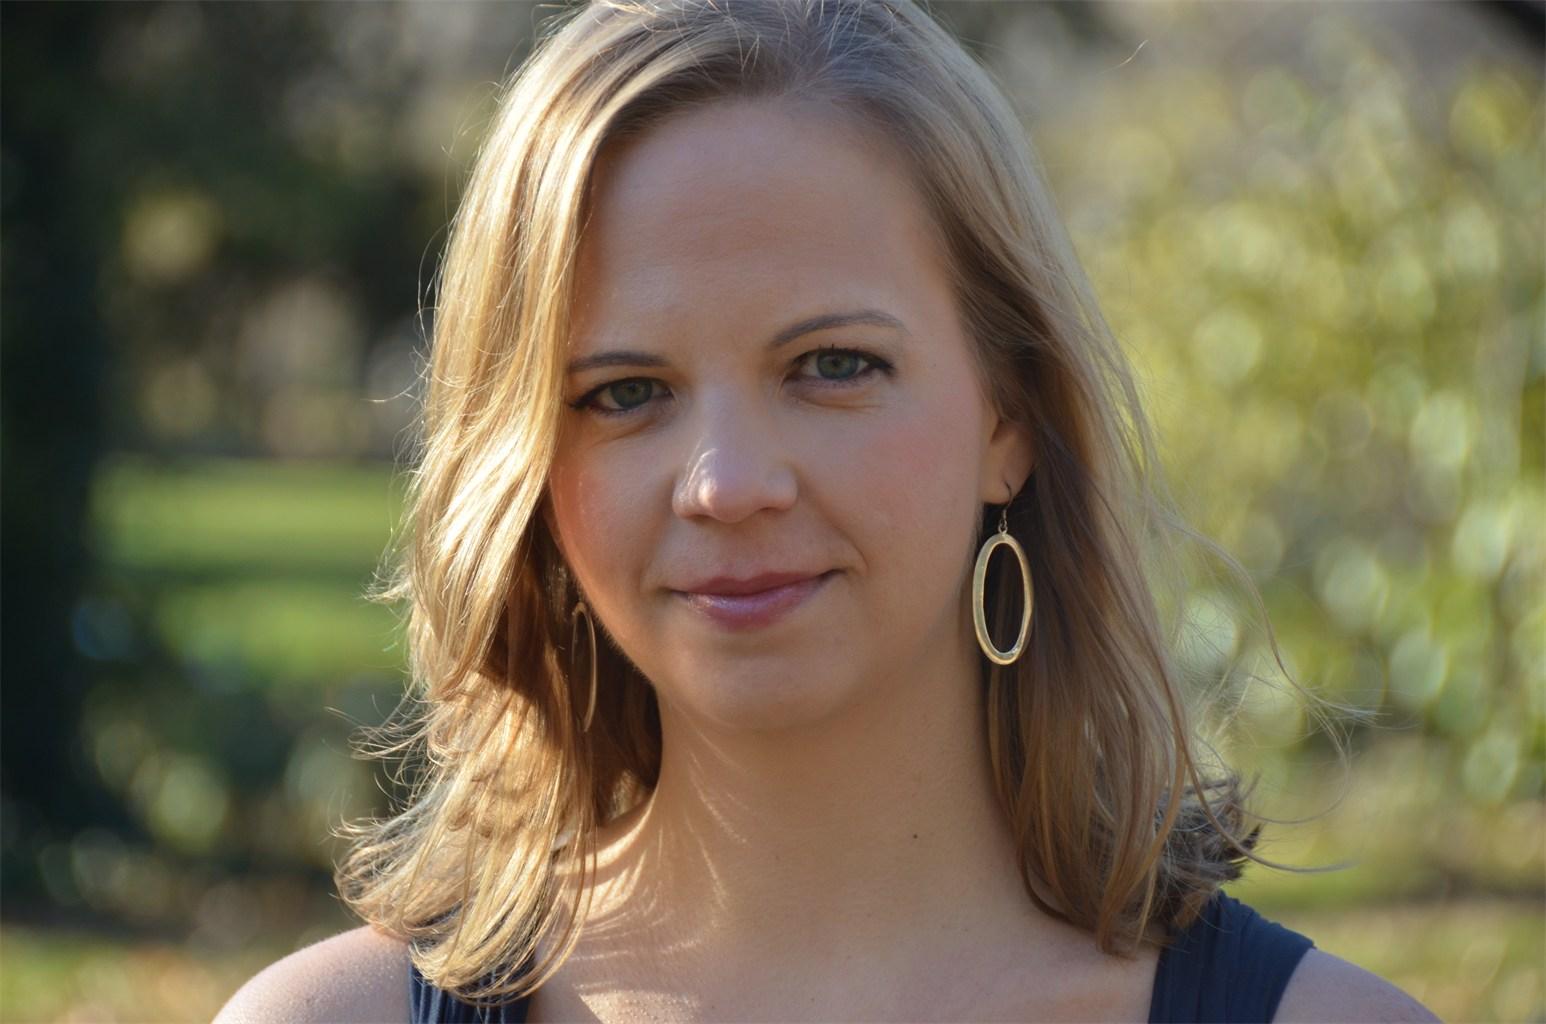 Katie Reimer